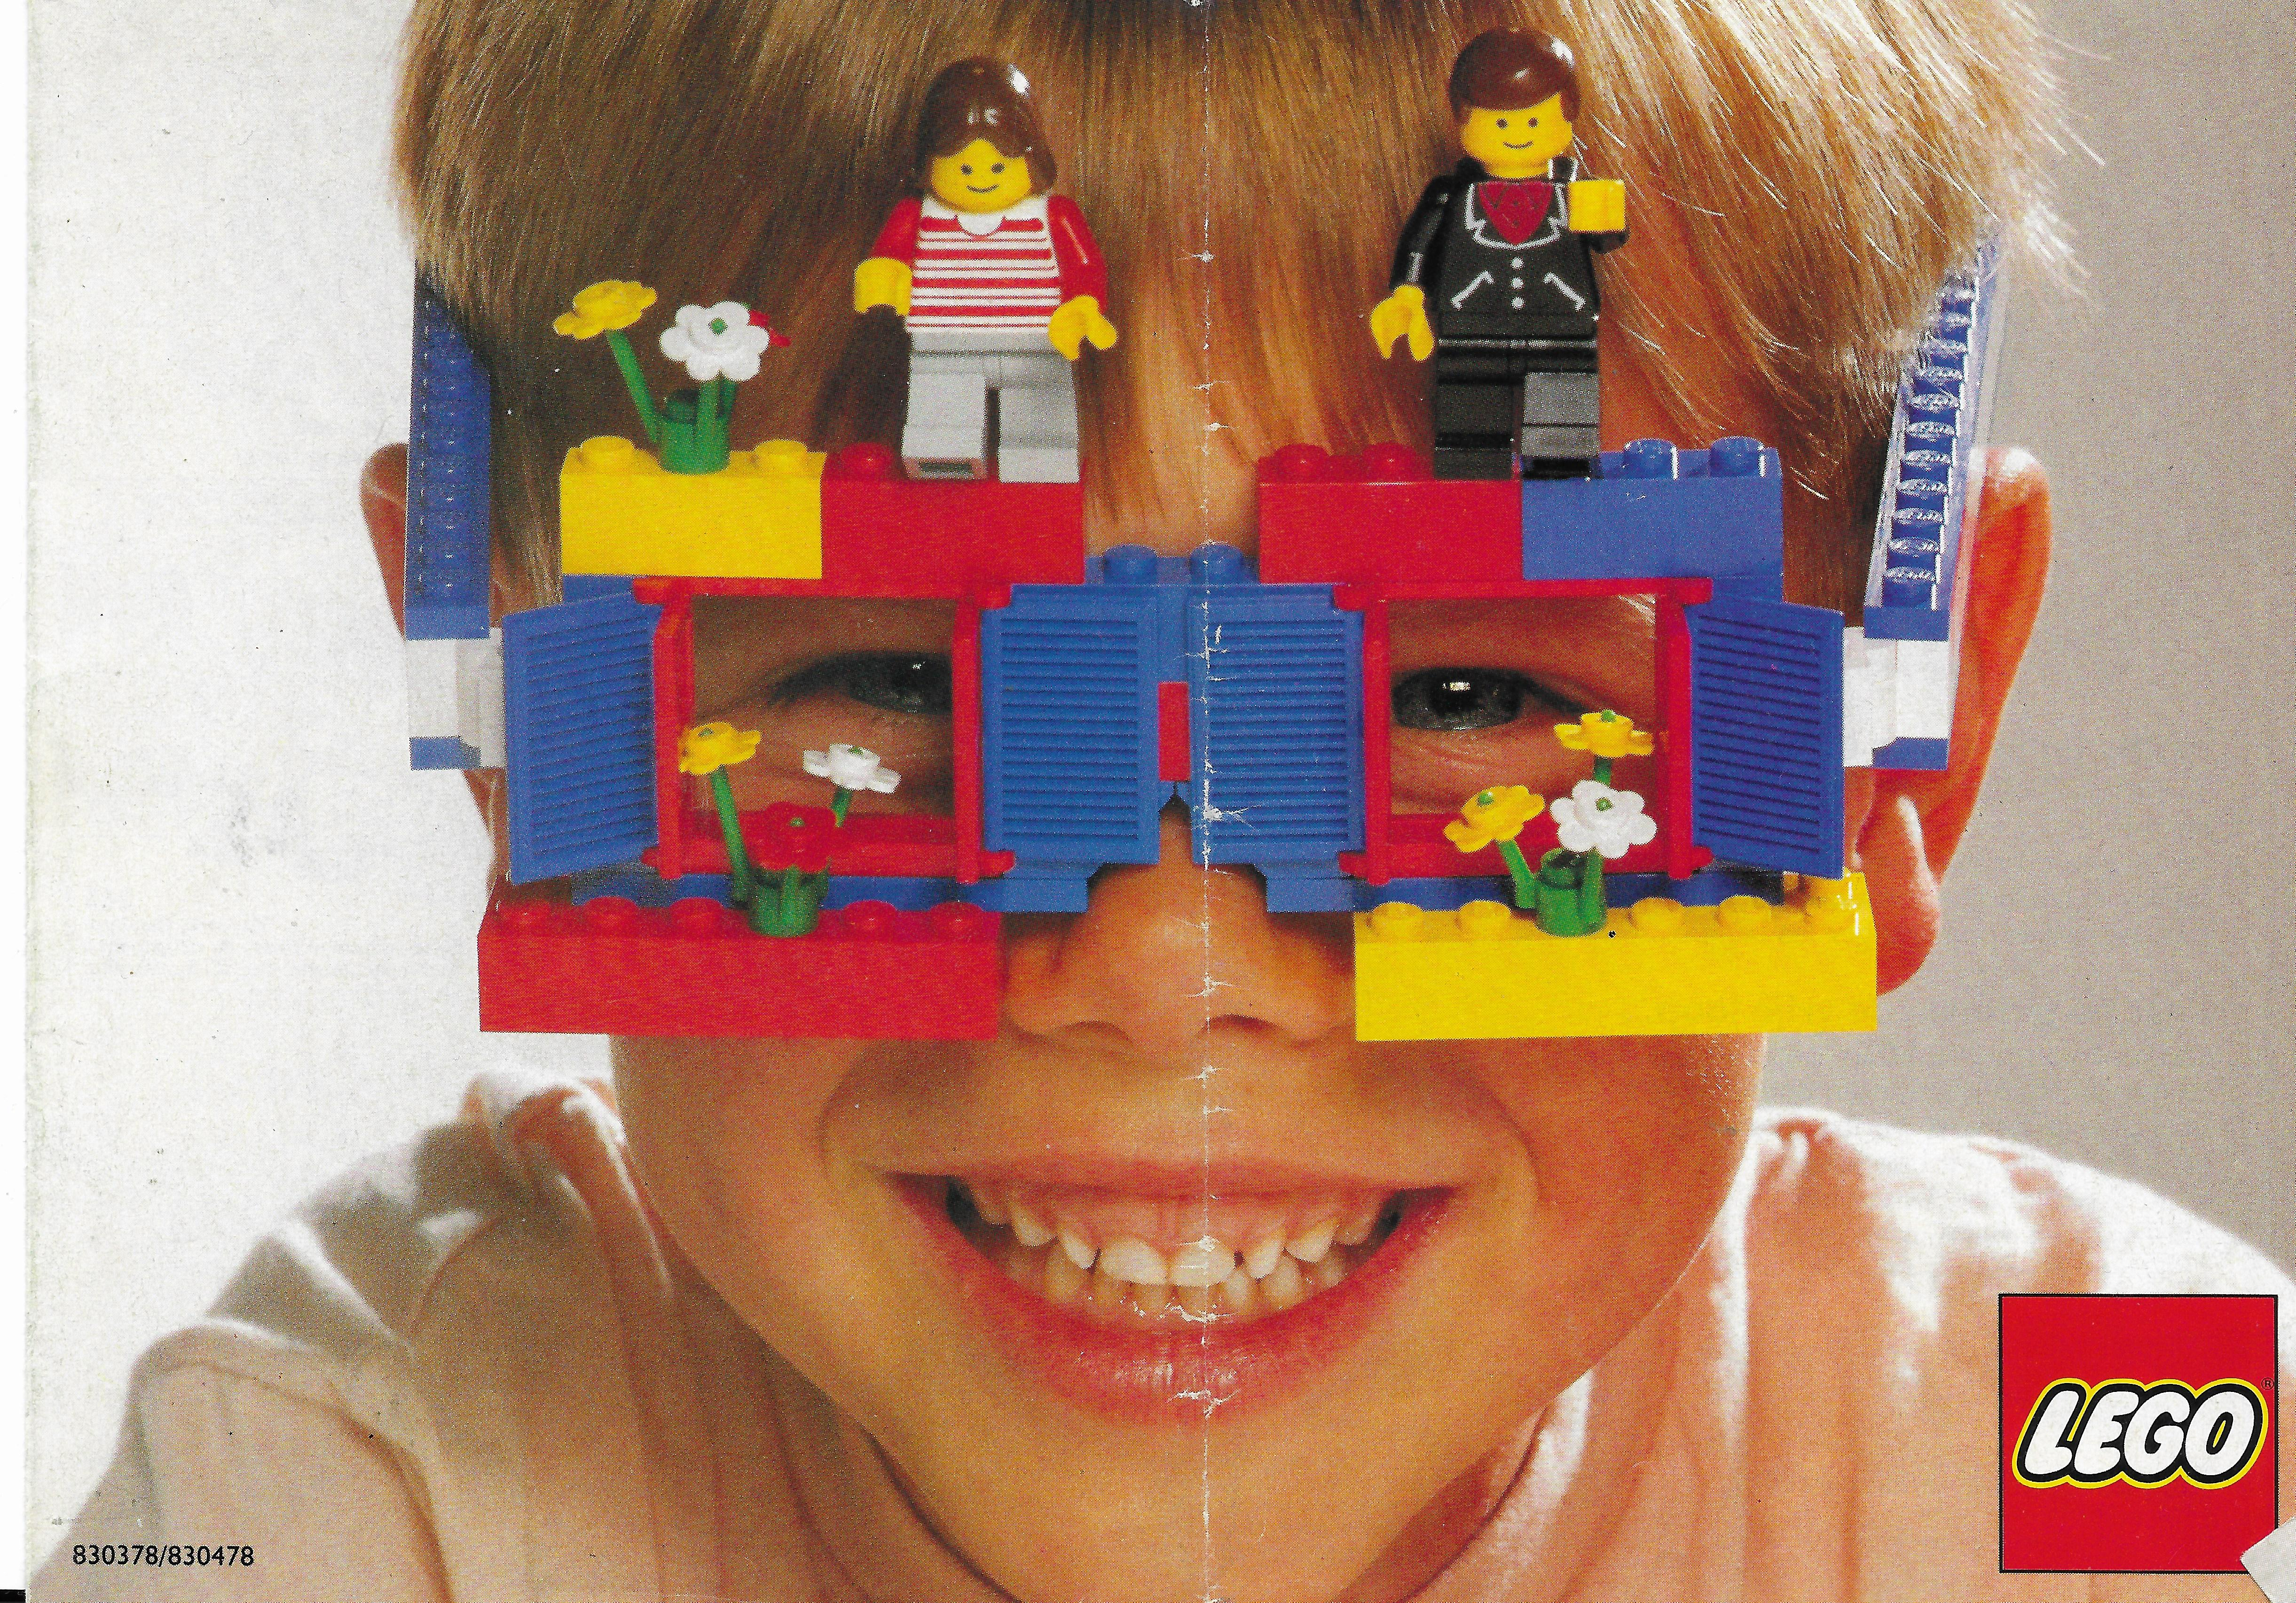 1991-es holland Lego Basic katalógus